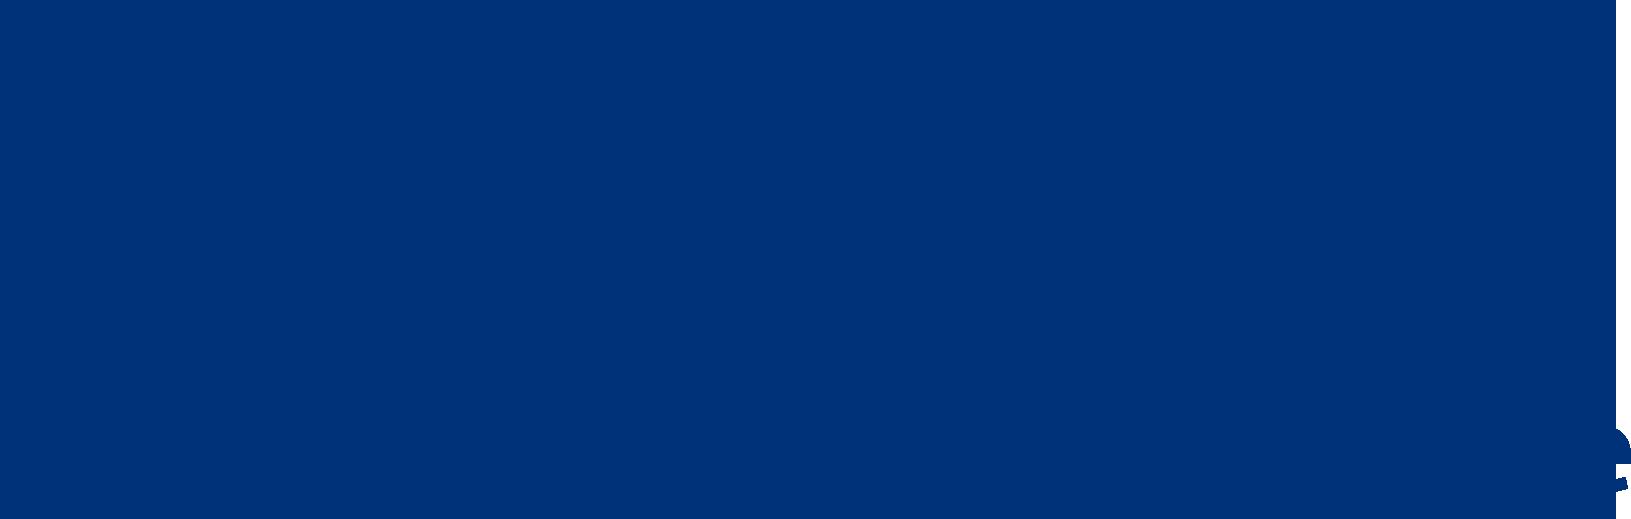 IDCがアジア太平洋地域の3Dプリンティング関連市場が2021年に36憶ドル規模に拡大と予想